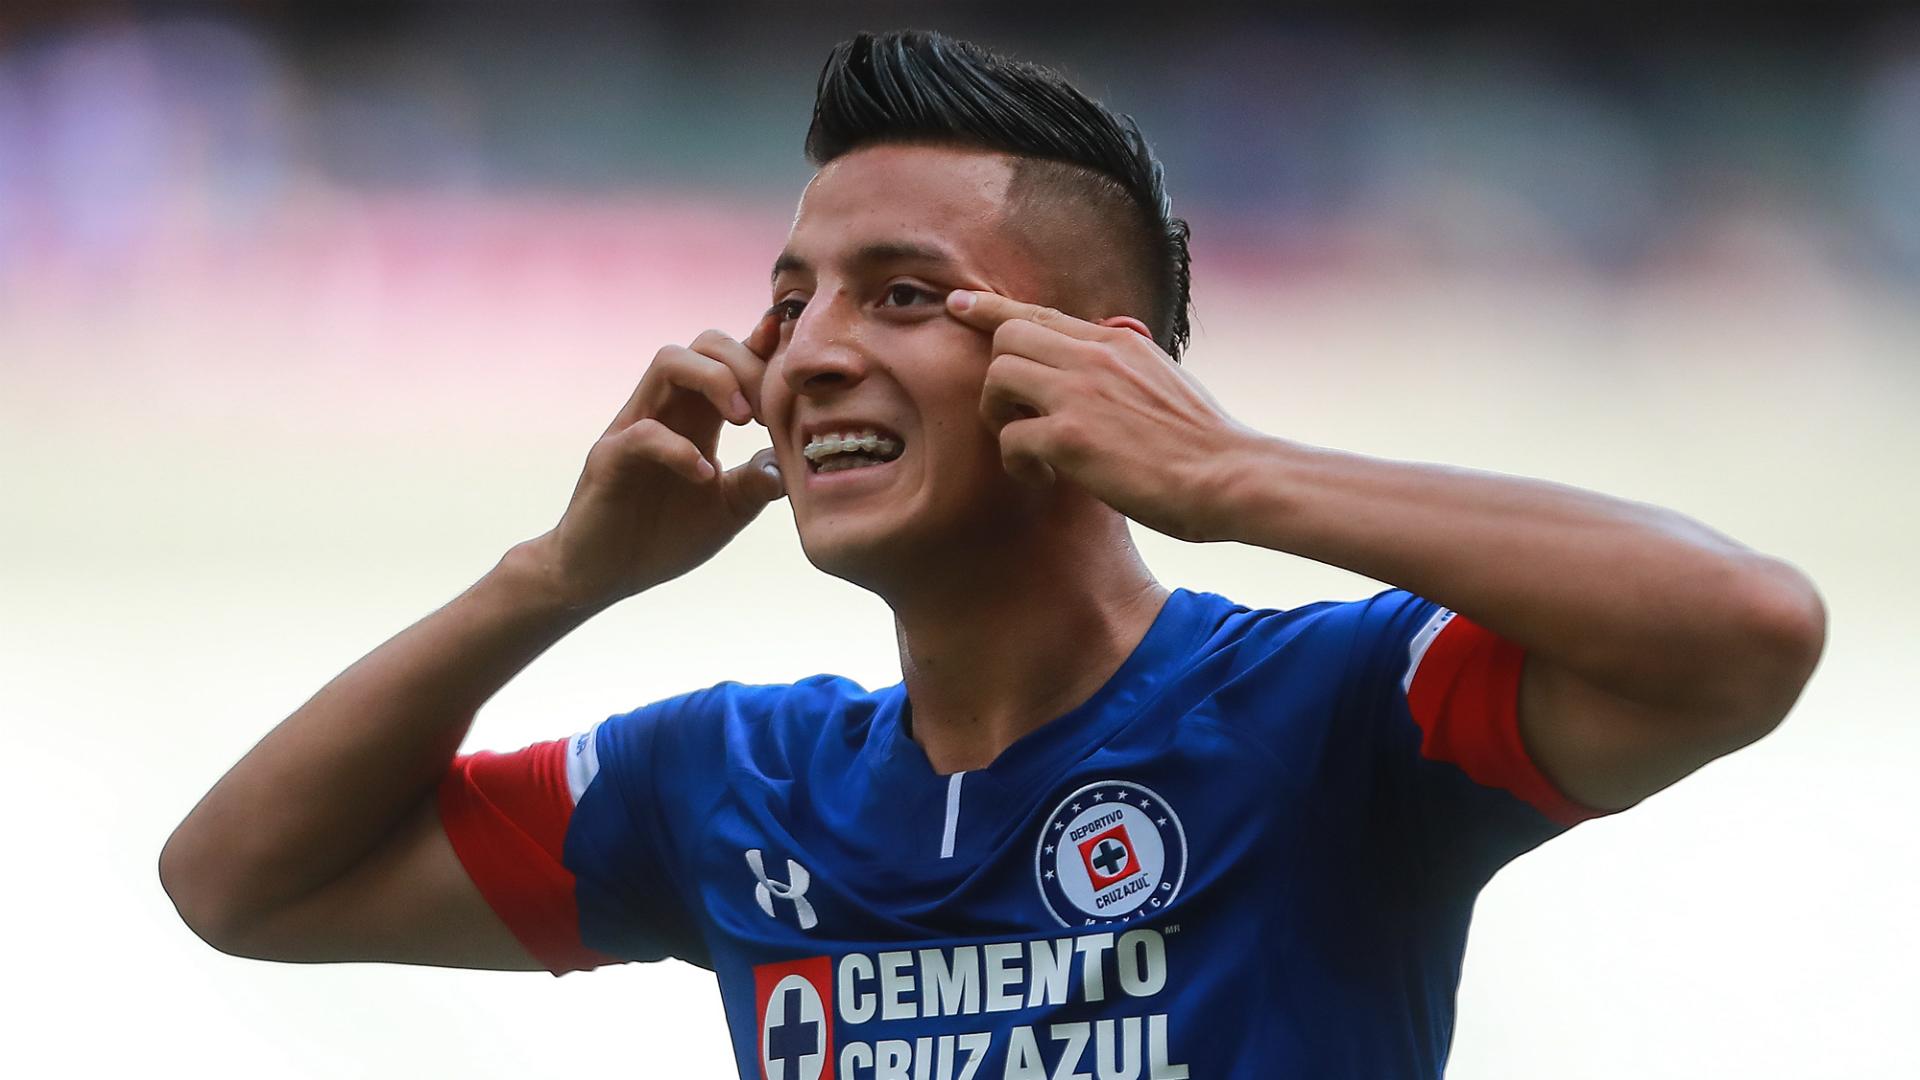 Roberto Alvarado Cruz Azul